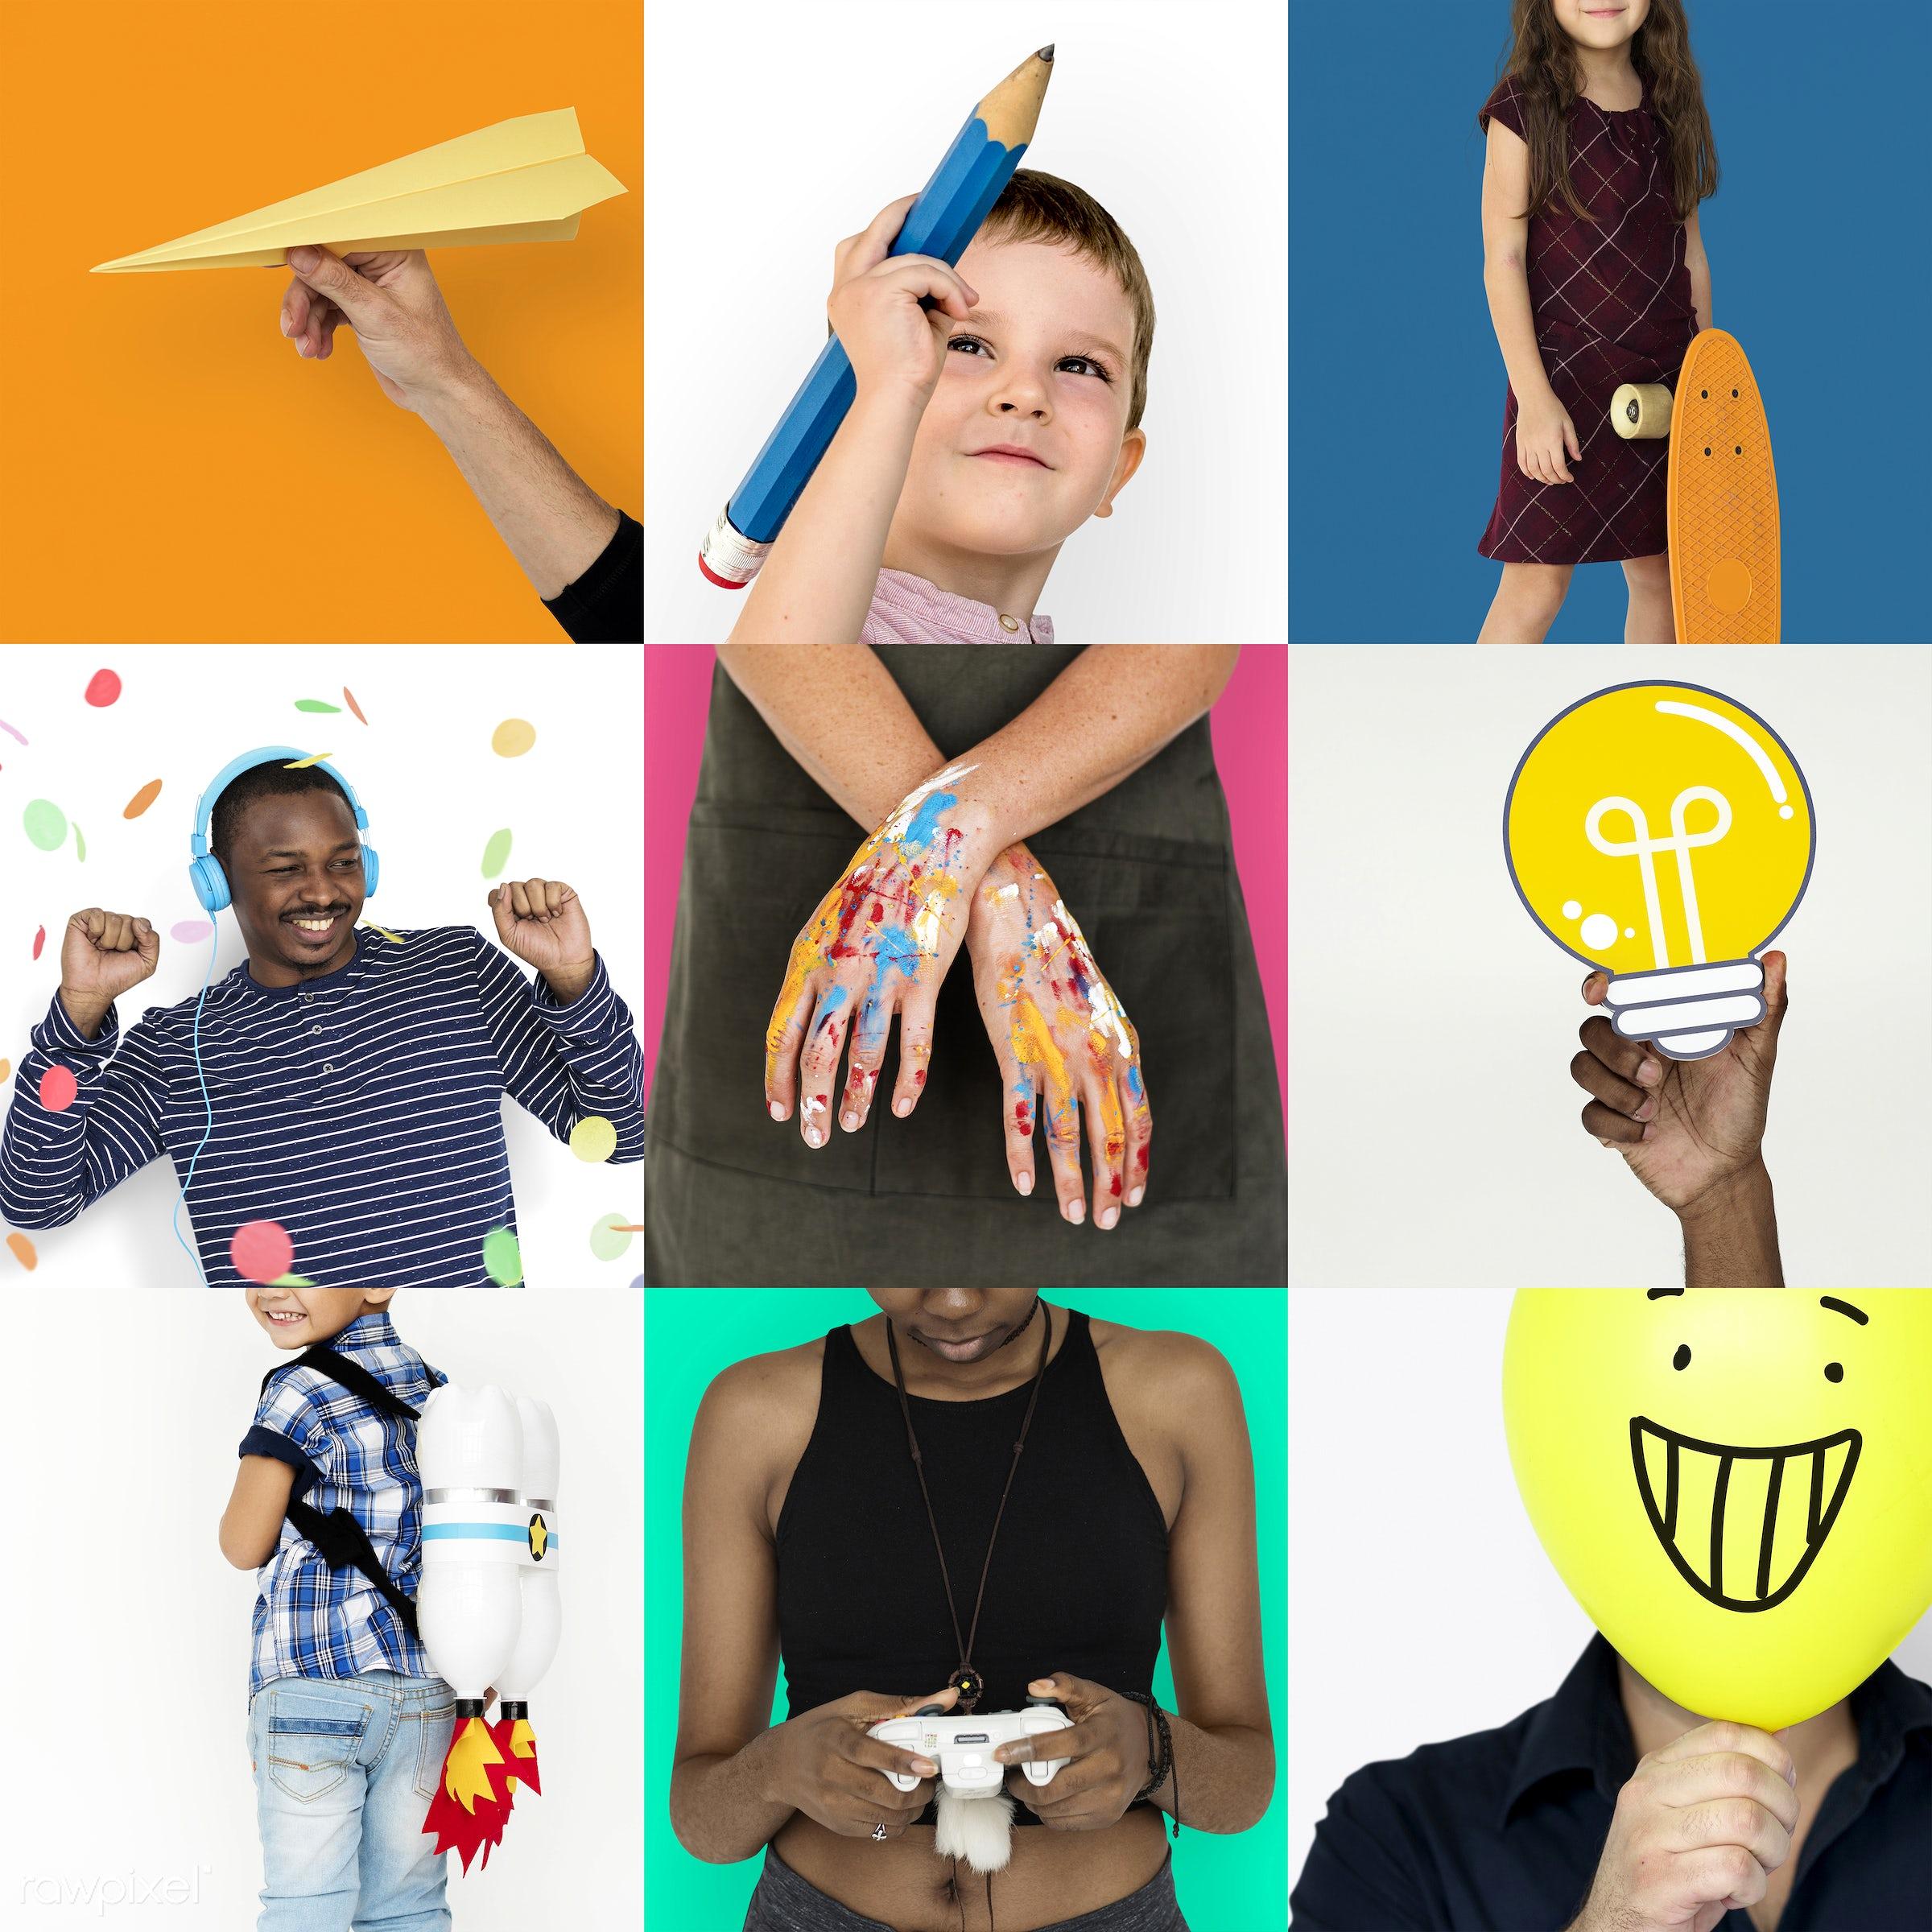 expression, studio, invention, face, creation, innovate, person, fresh ideas, set, motivation, imagination, creativity,...